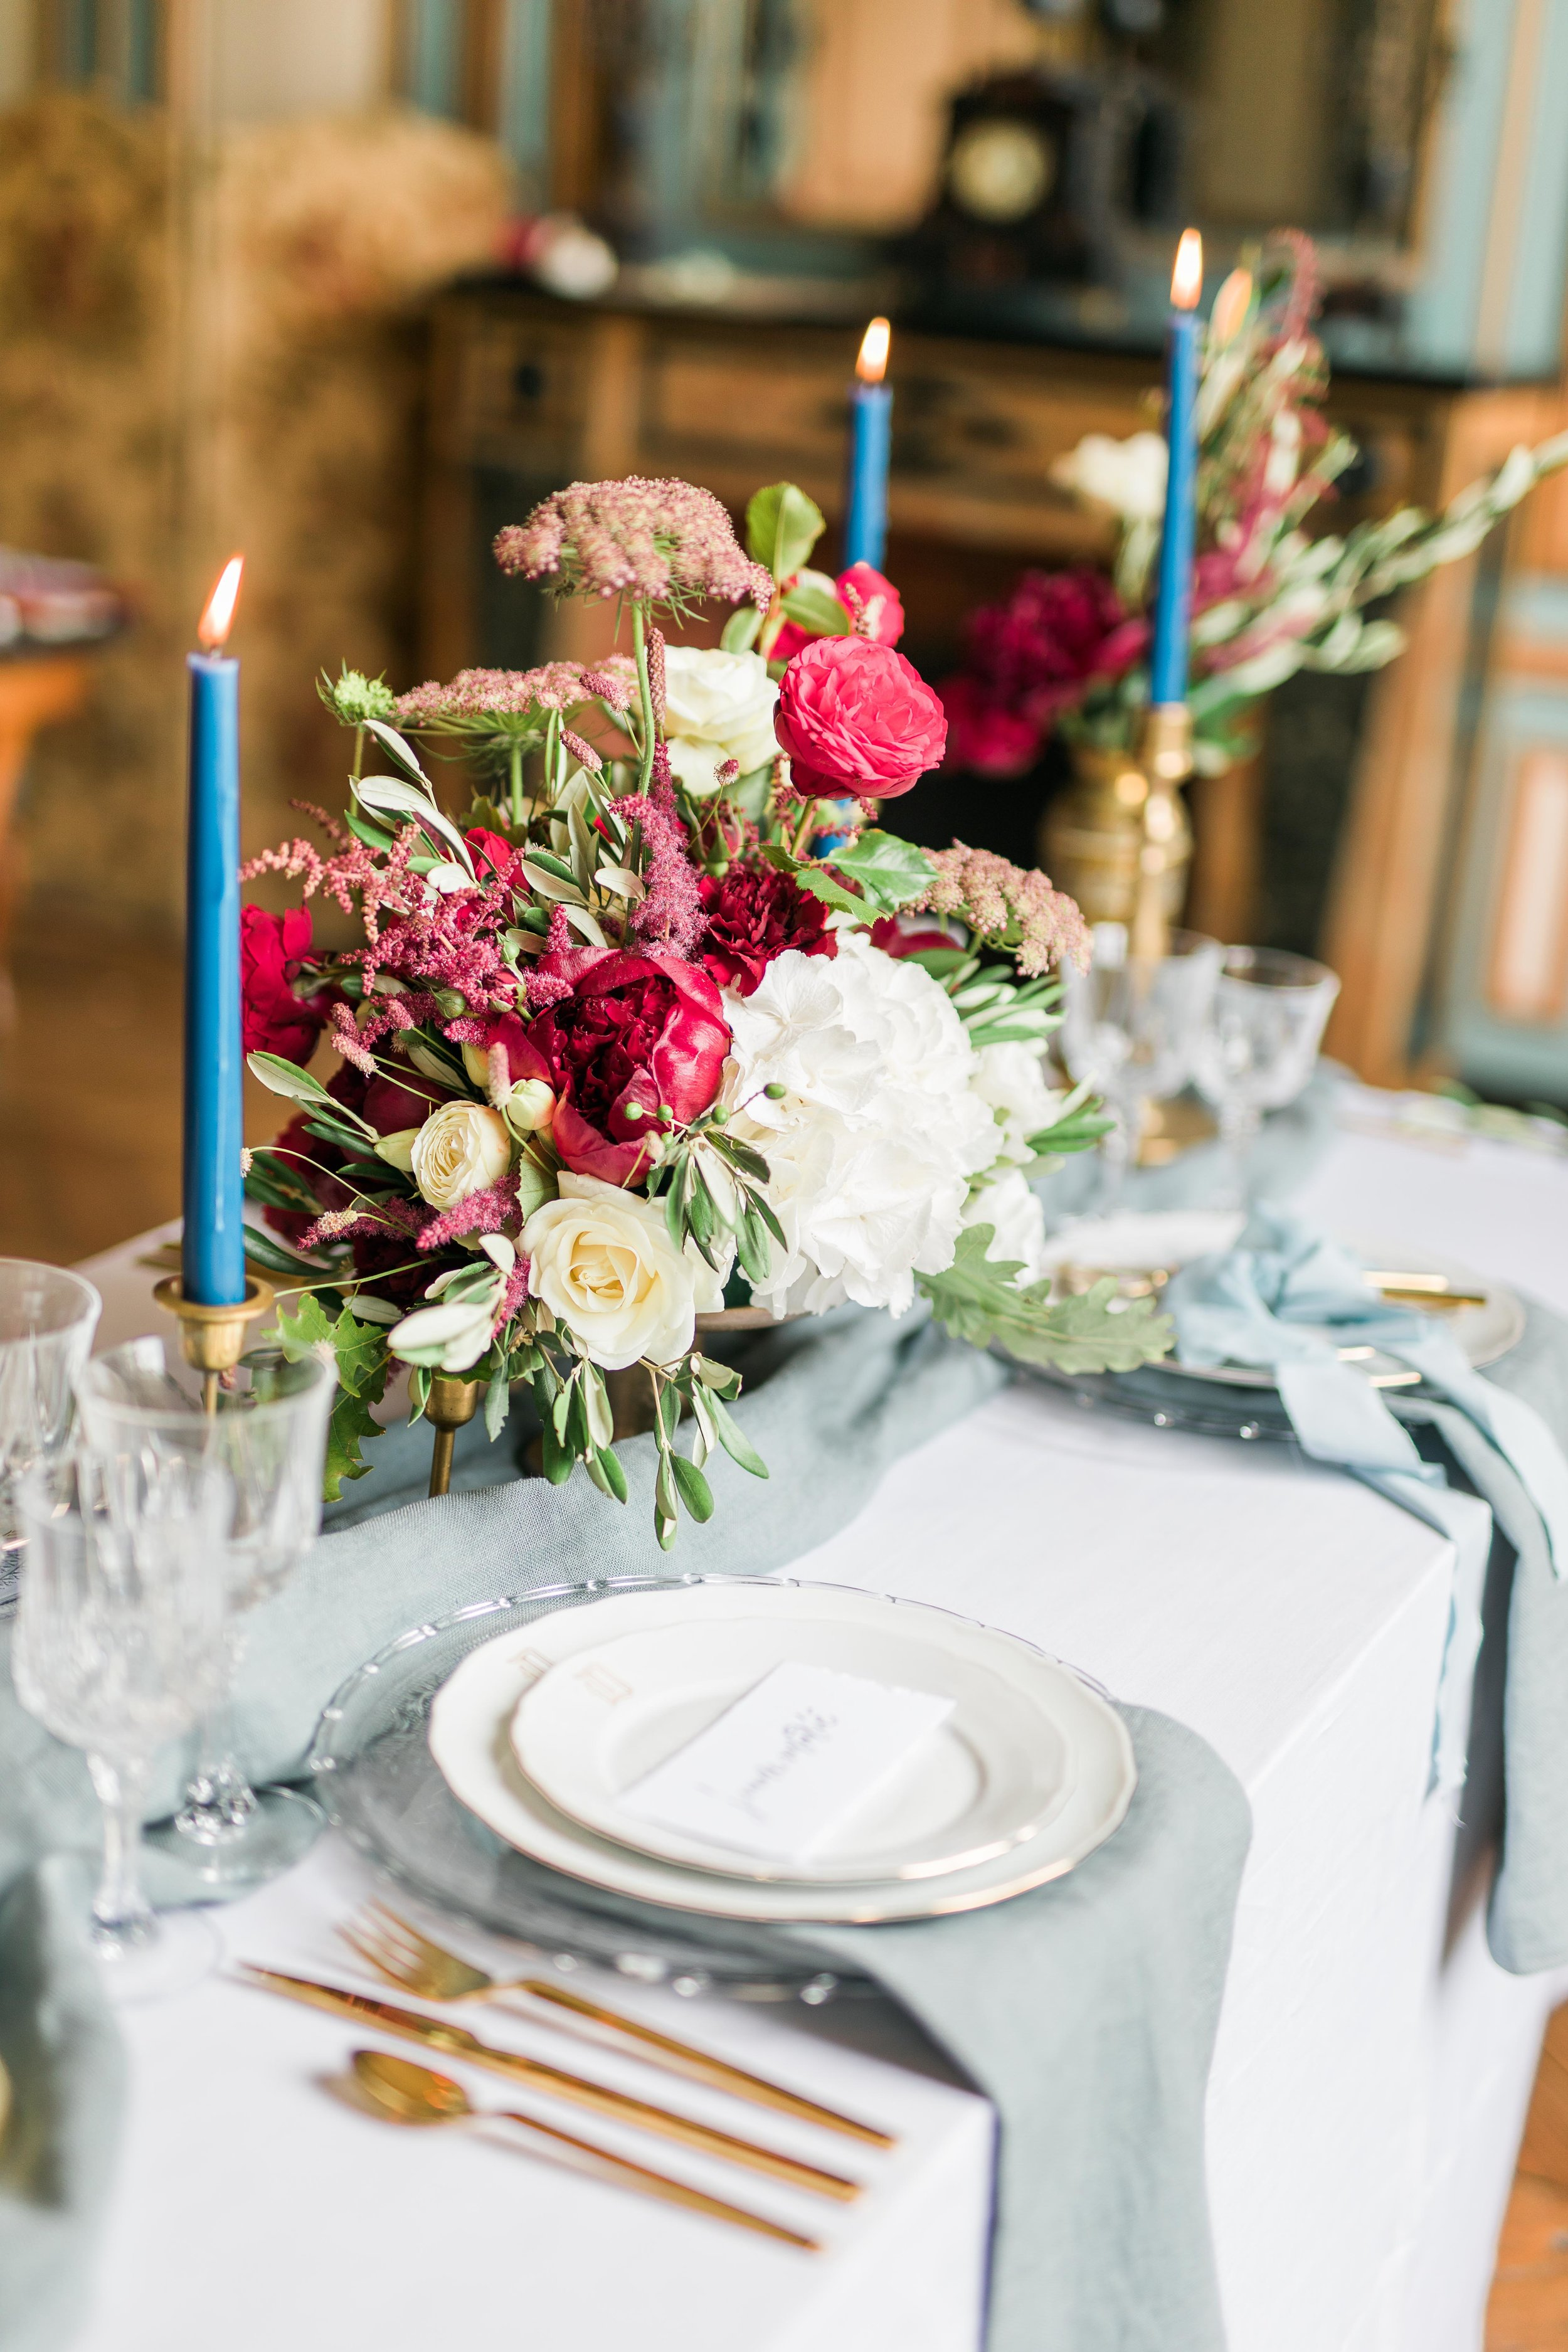 JBJ Pictures - Wedding Photographer San Francisco - Napa - Sonoma - SF Engagement Photos (51).jpg